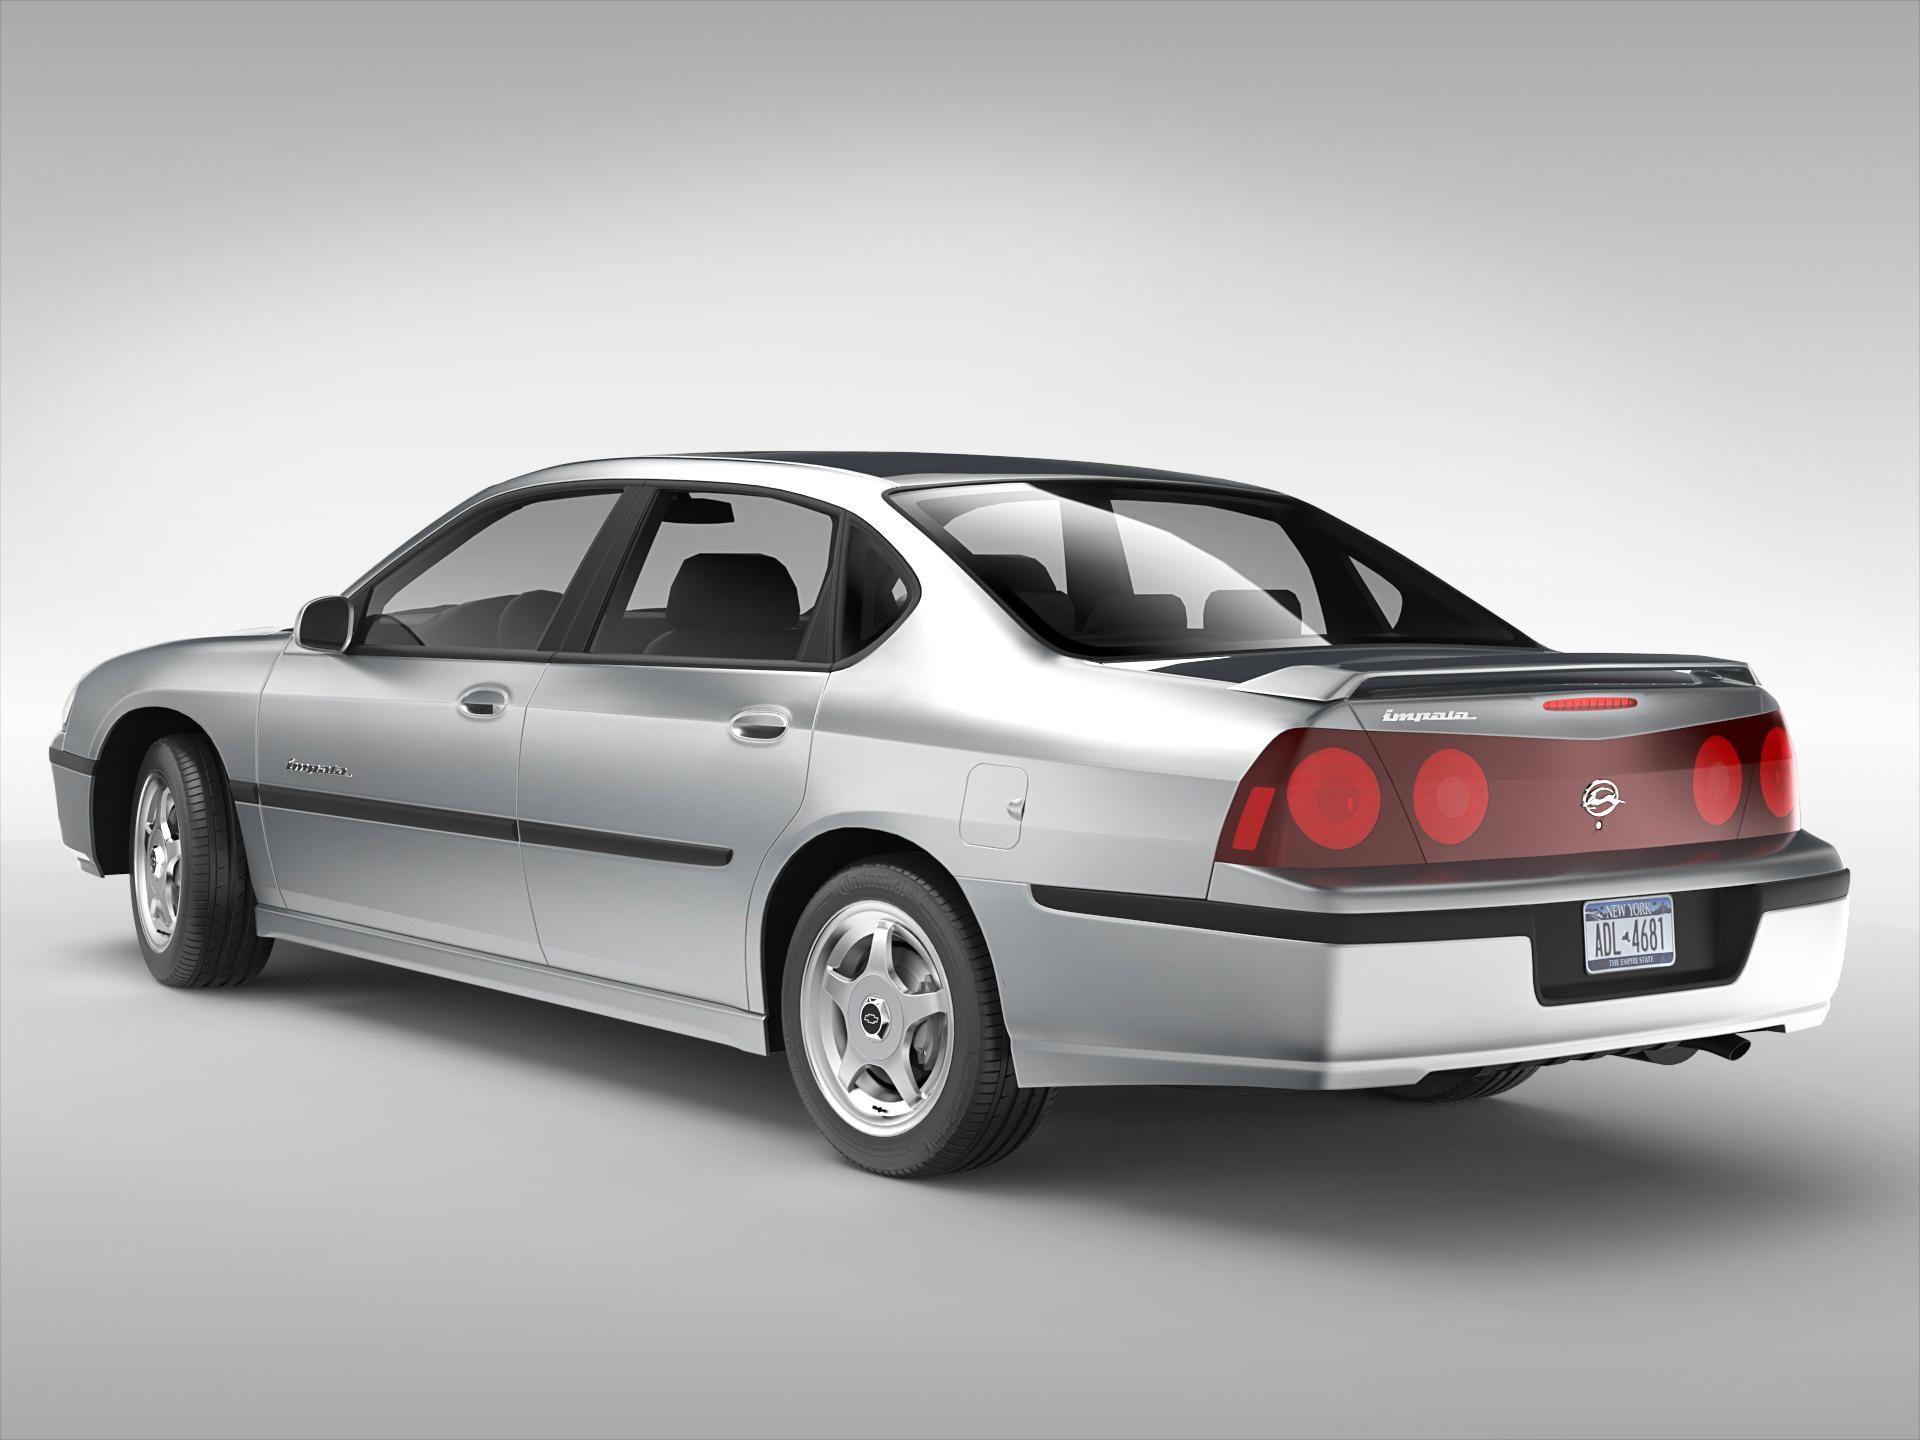 Chevrolet Impala 2000 2005 3d Model Ad Impala Chevrolet Model Chevrolet Impala Impala Chevy Impala